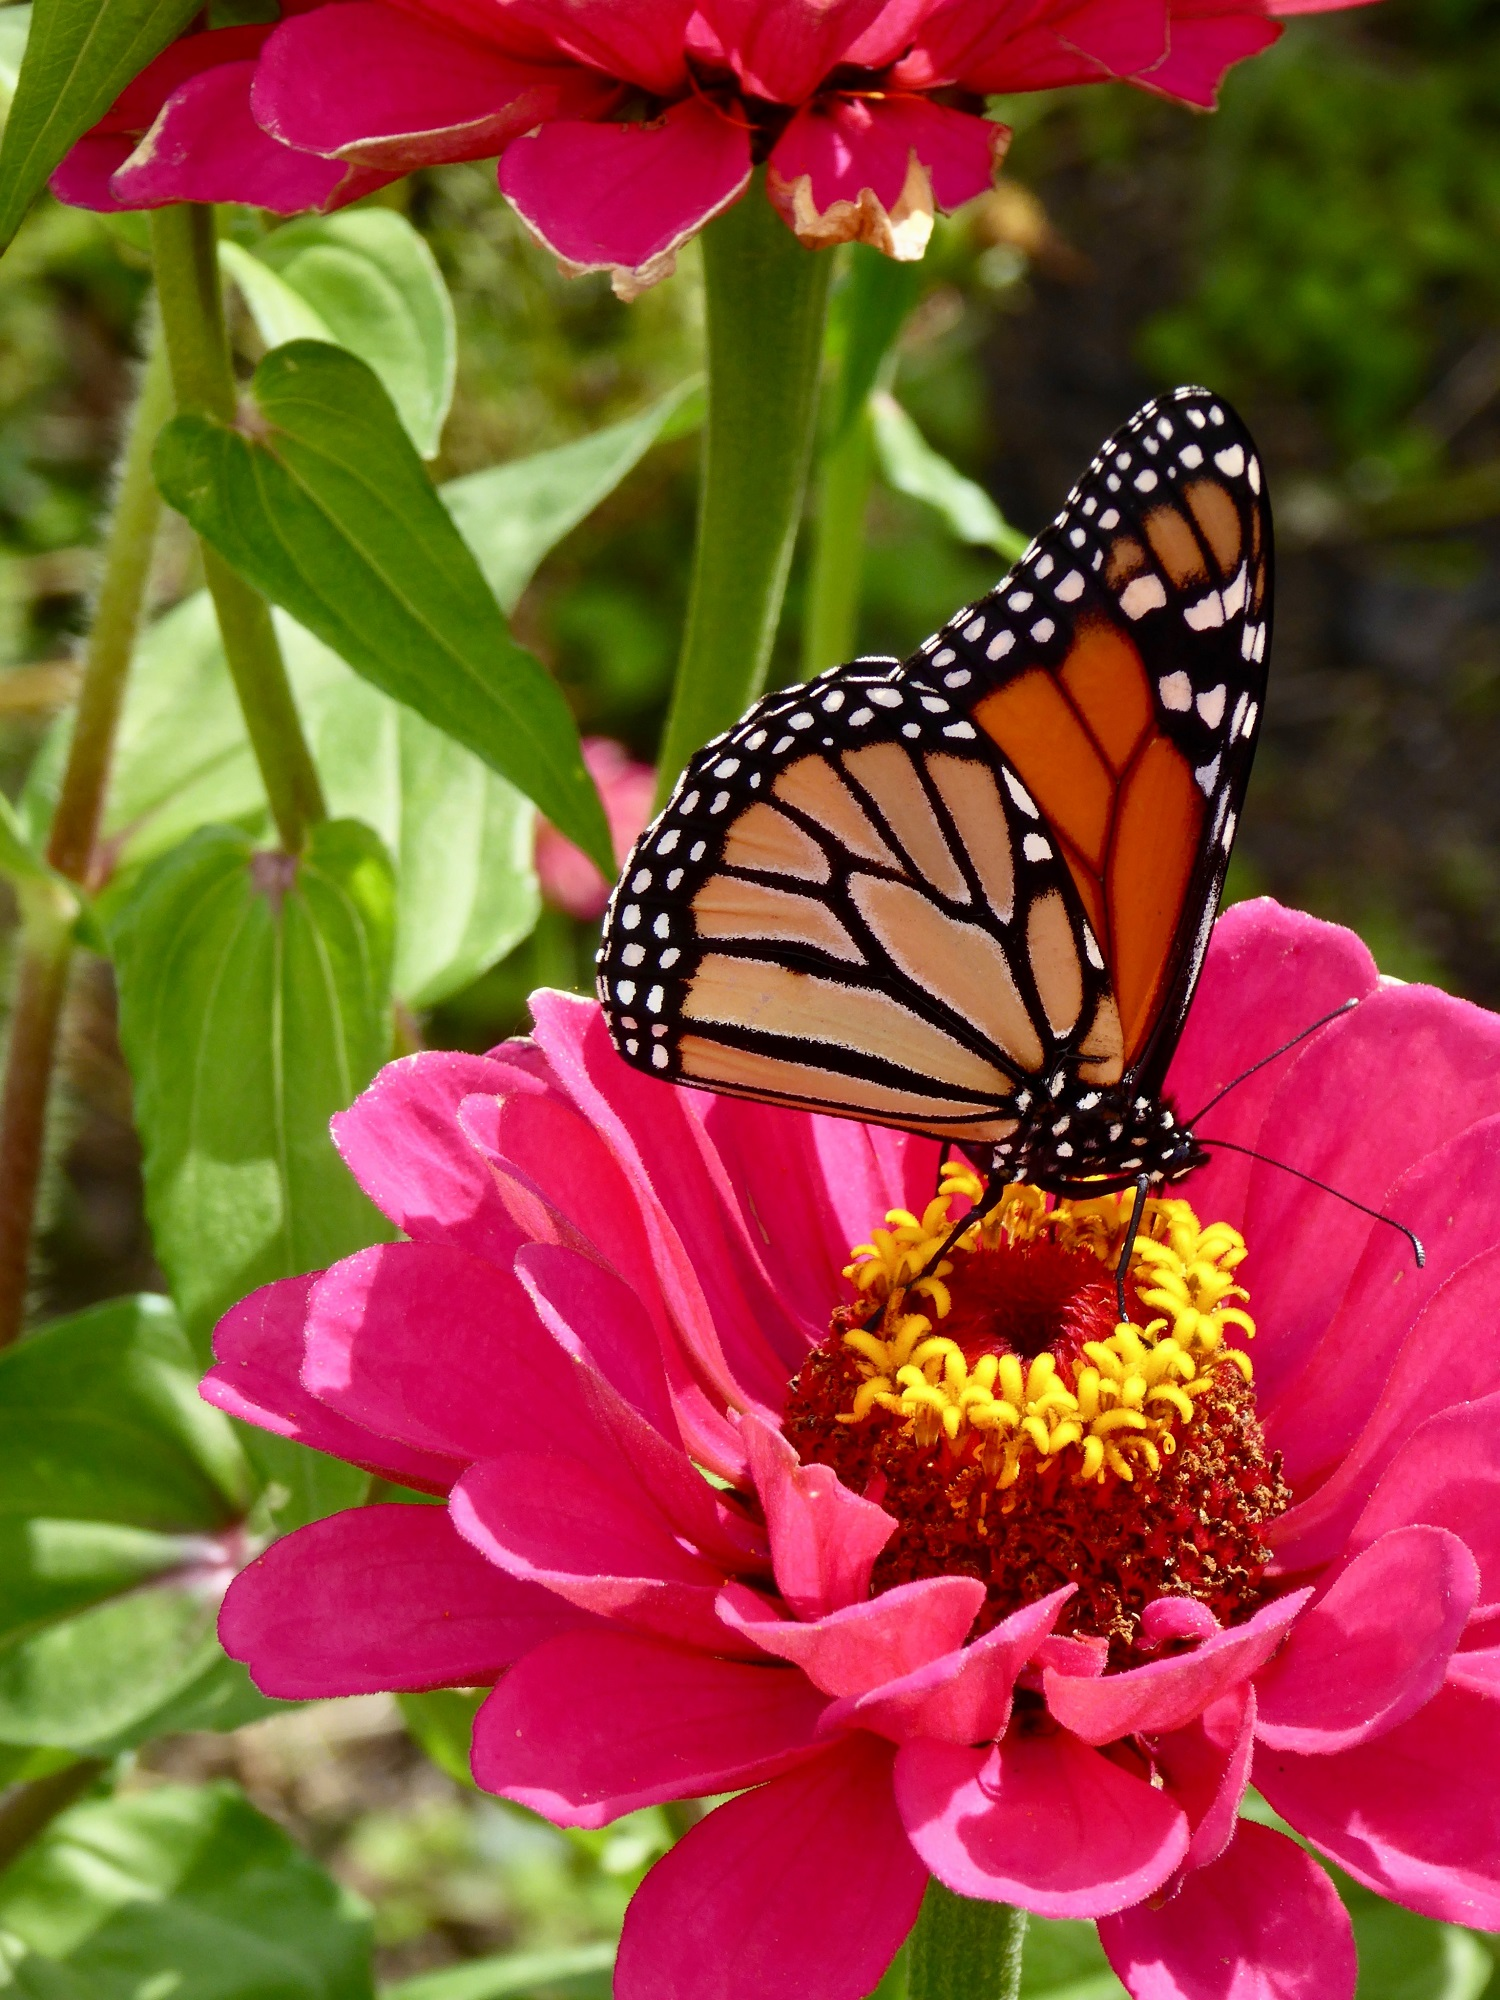 Butterfly feasting on flower